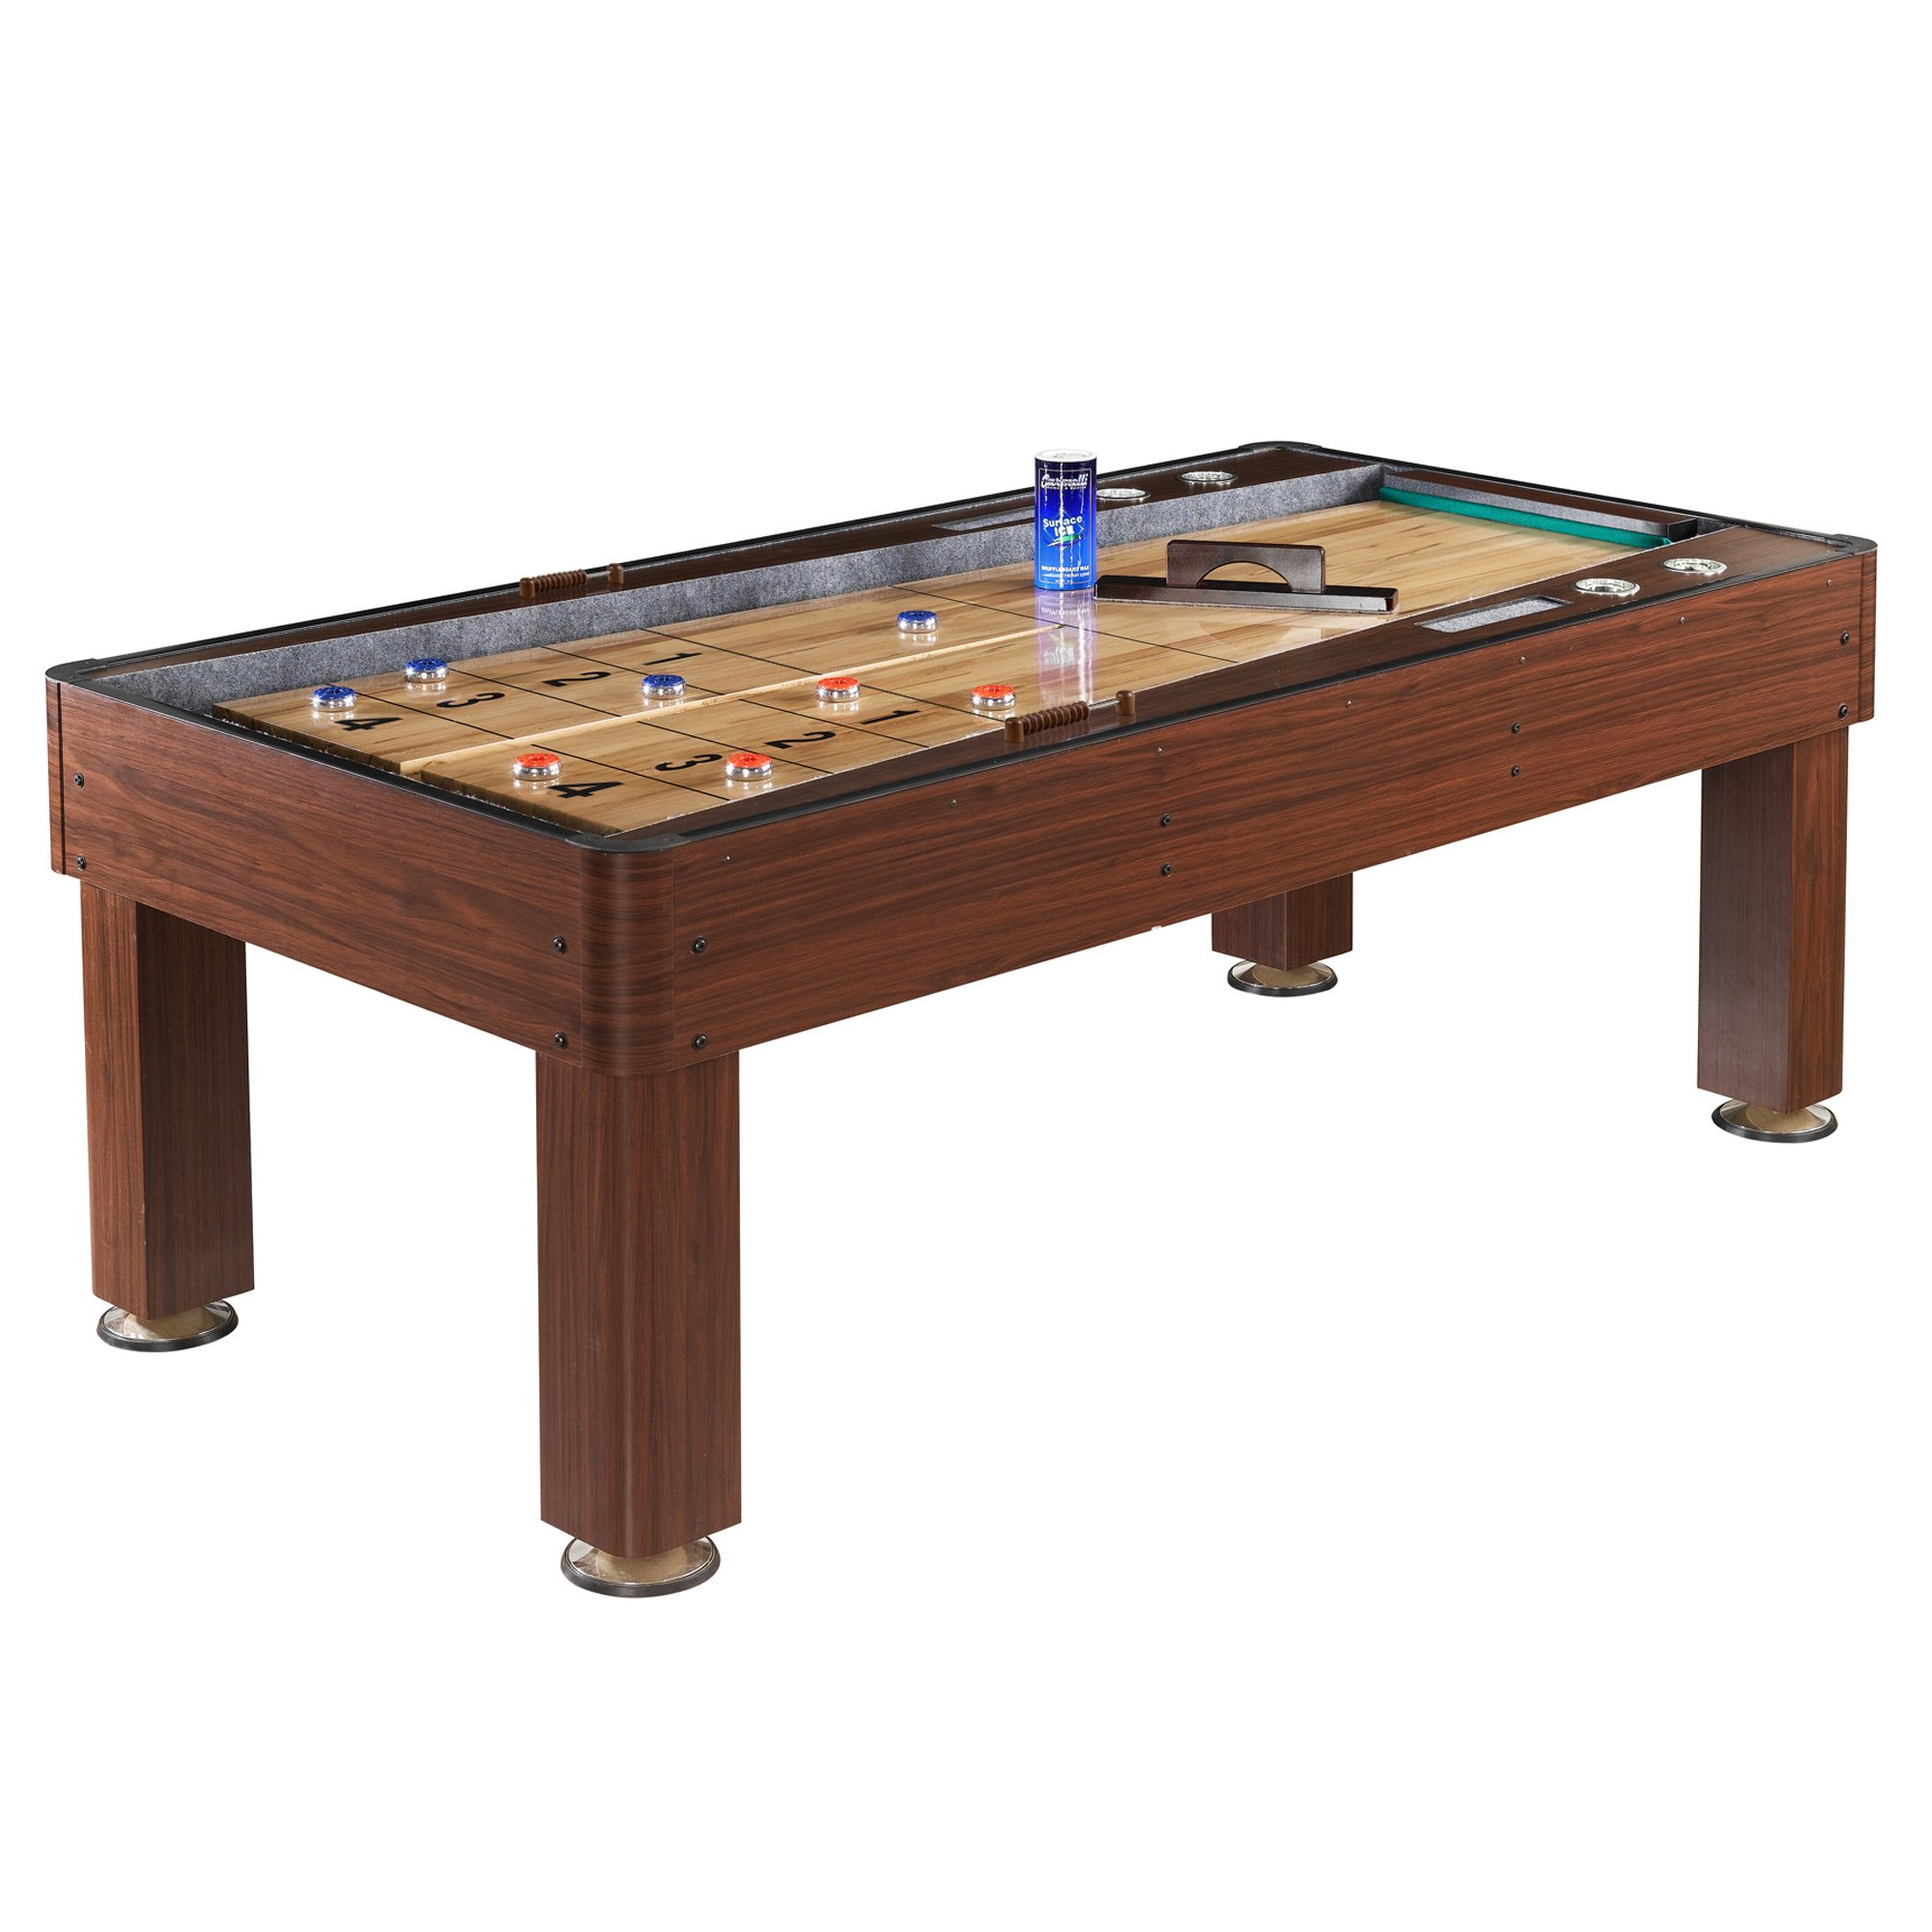 Hathaway Ricochet Shuffleboard Table, Cherry Finish, 7-Feet